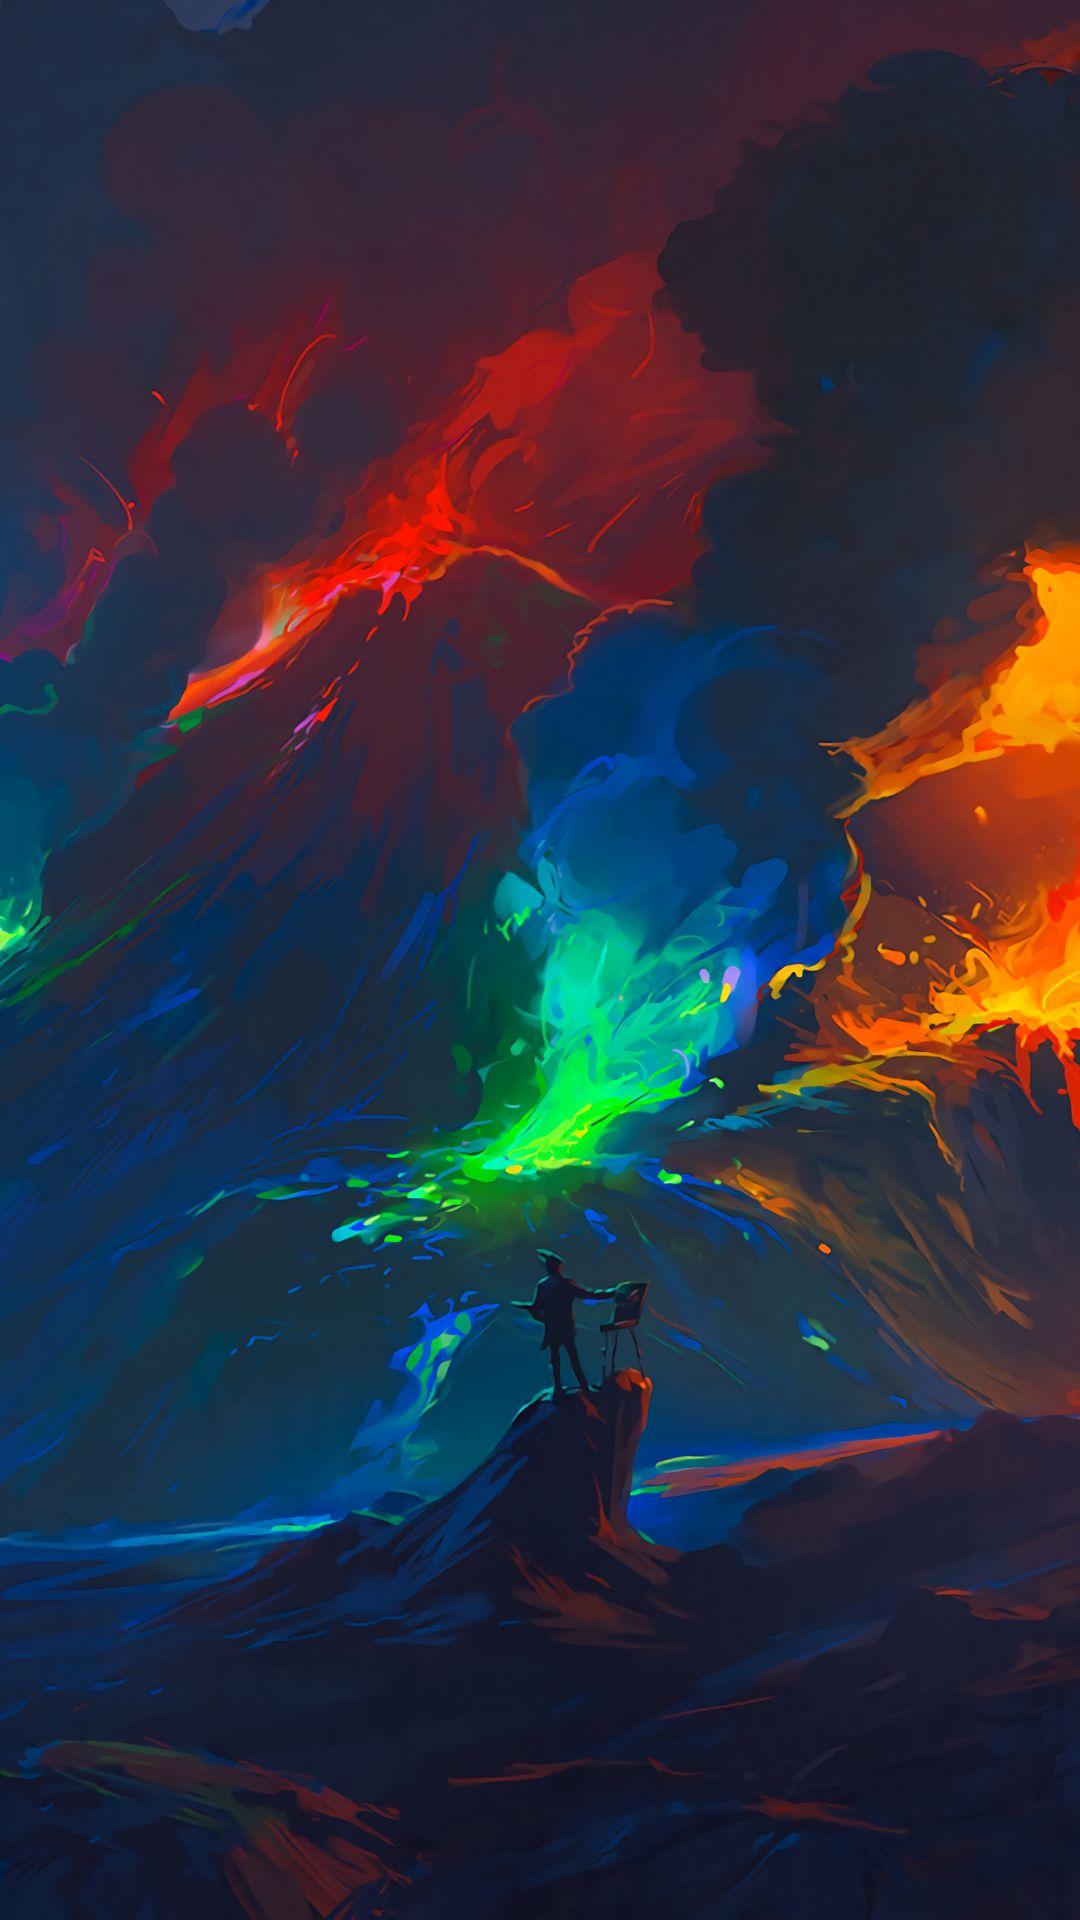 1080x1920 Обои художник, волны, красочный, арт, фантазия